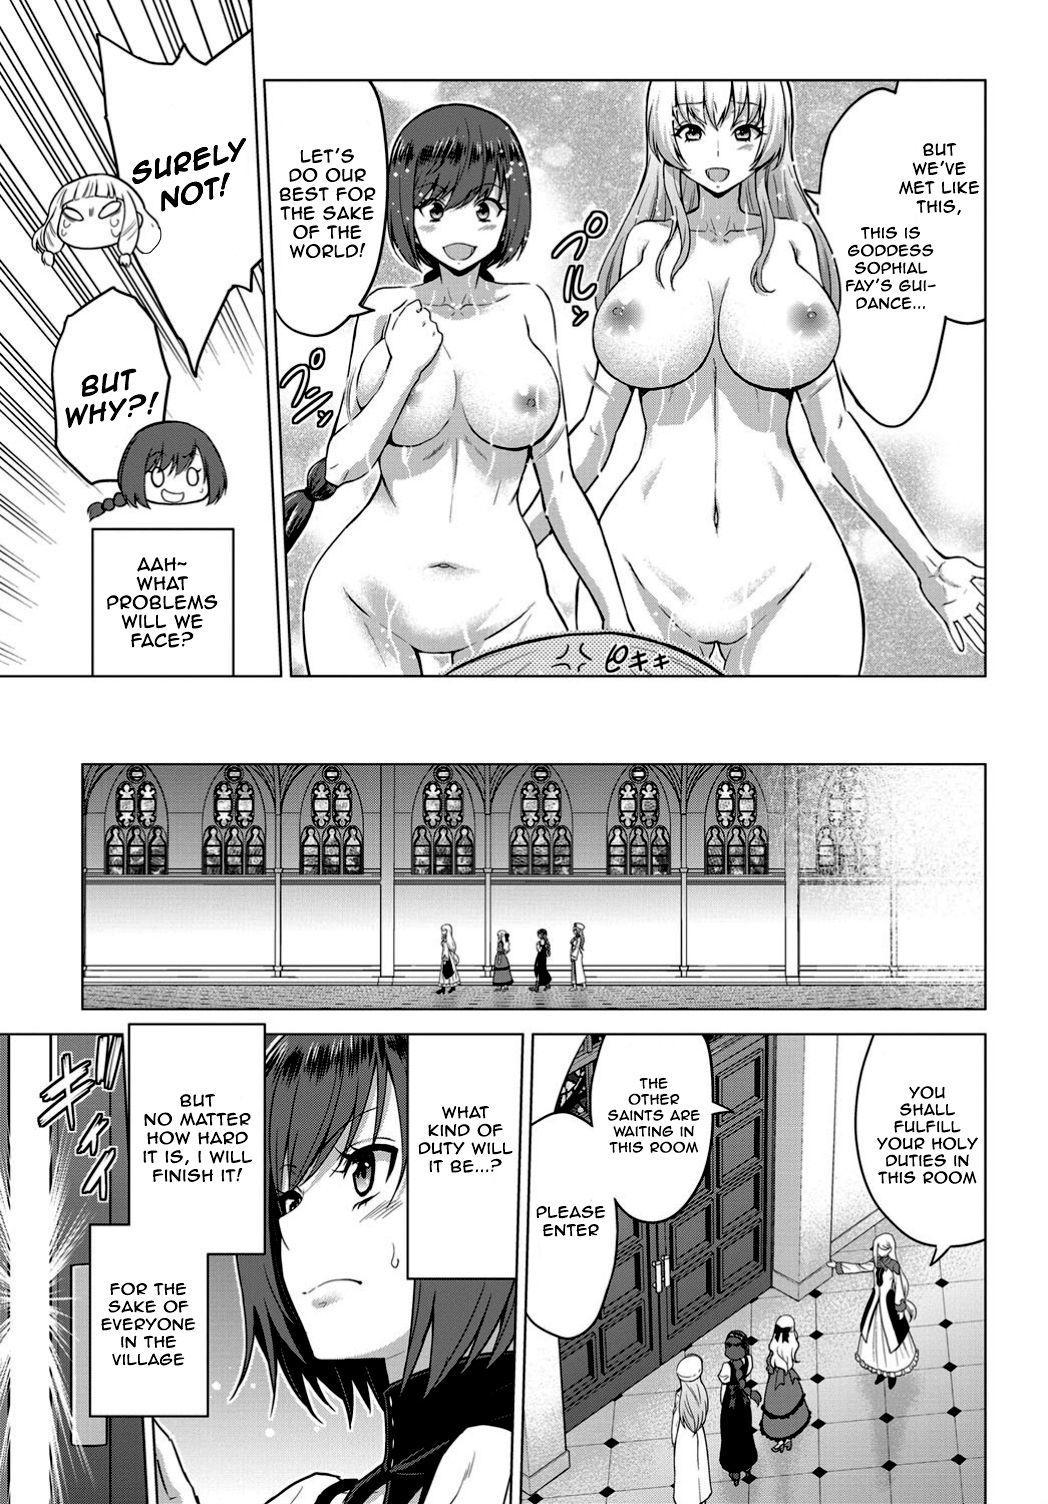 [Yamada Gogogo] Seijo no Rakuin -Annunciation of despair- #01 (COMIC BAVEL 2019-11) [English] {Stopittarpit} [Digital] 12